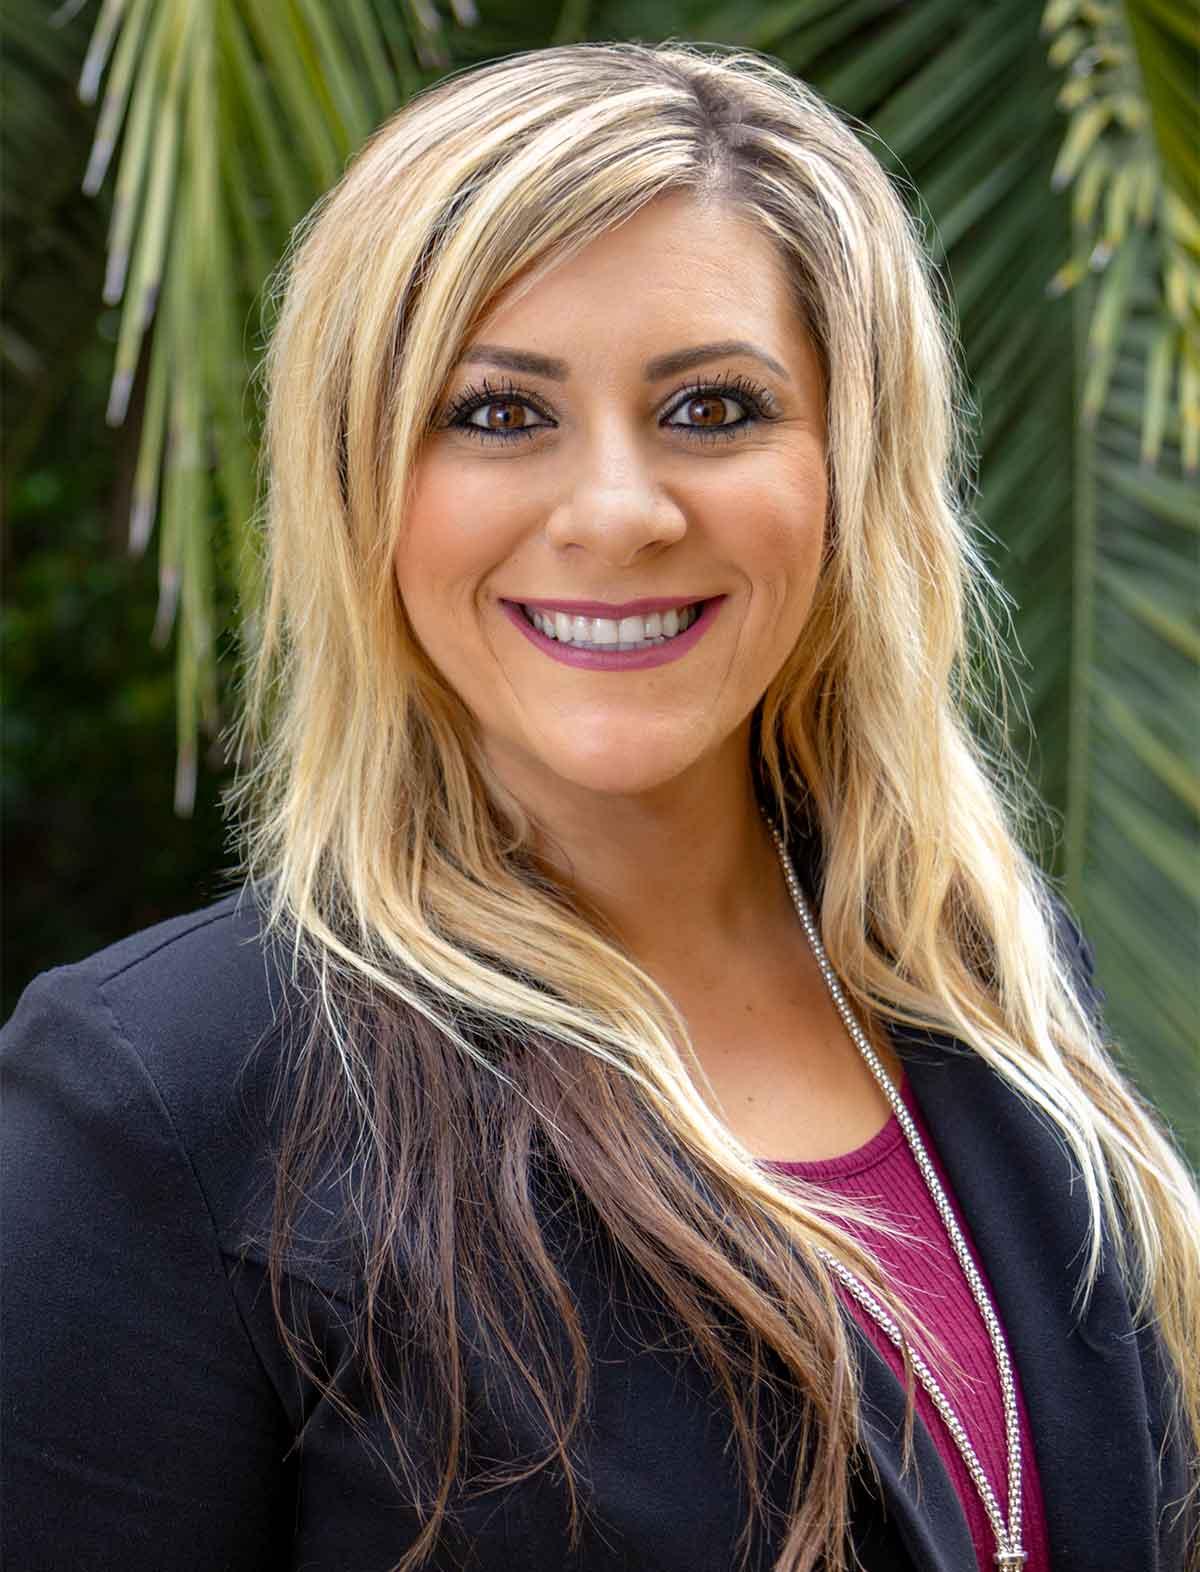 Susan Polk Insurance San Luis Obispo headshot Veronica